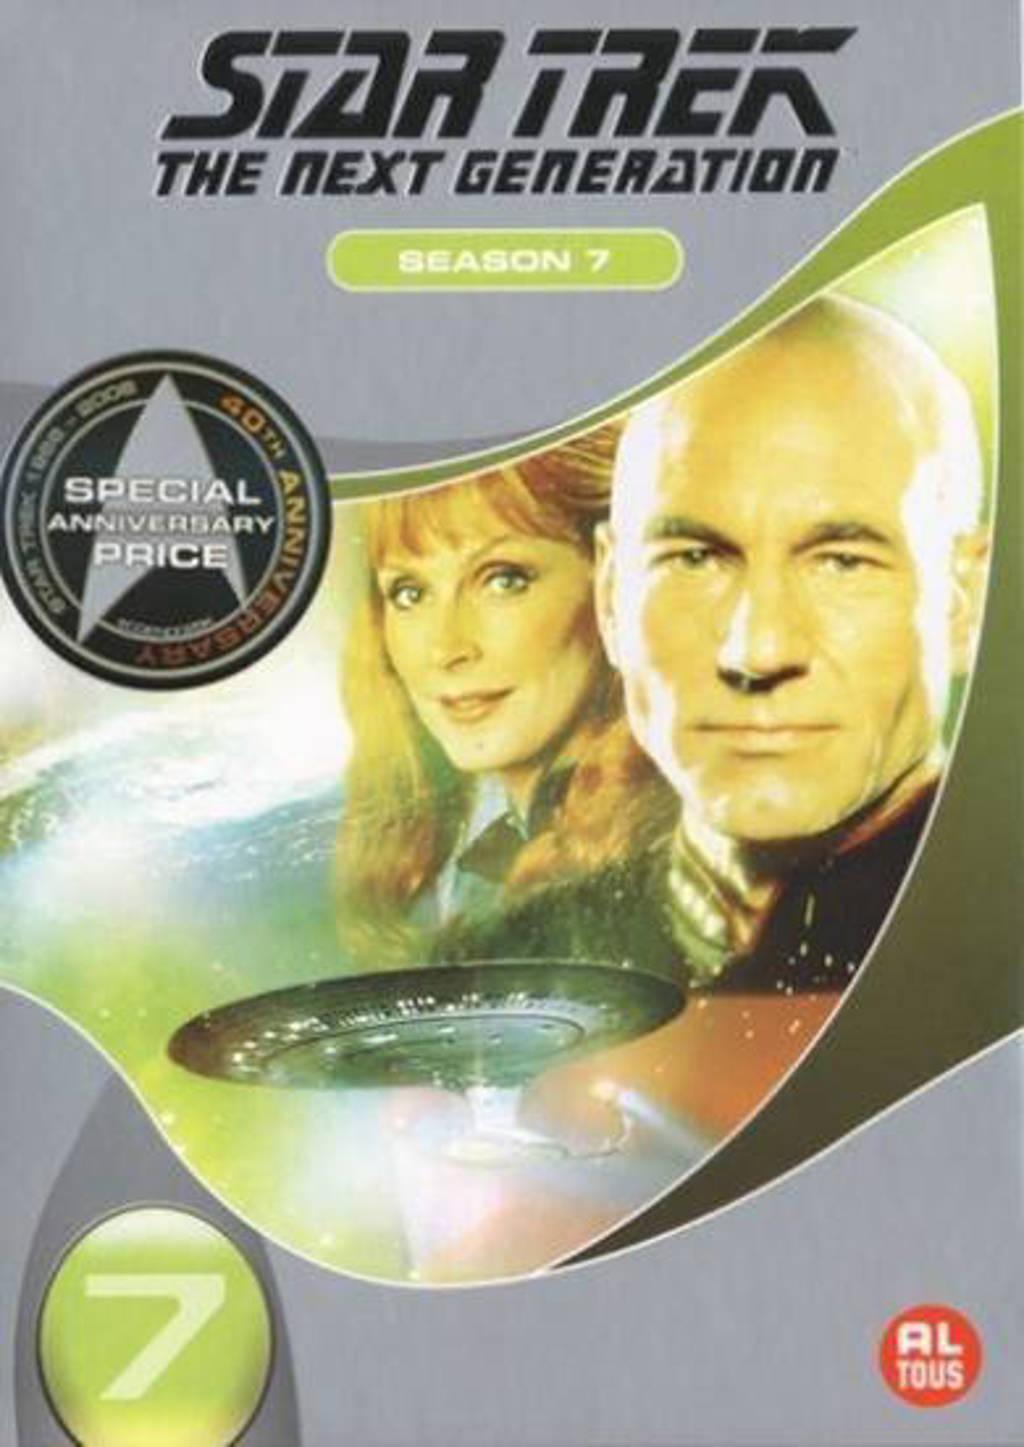 Star trek the next generation - Seizoen 7 (DVD)